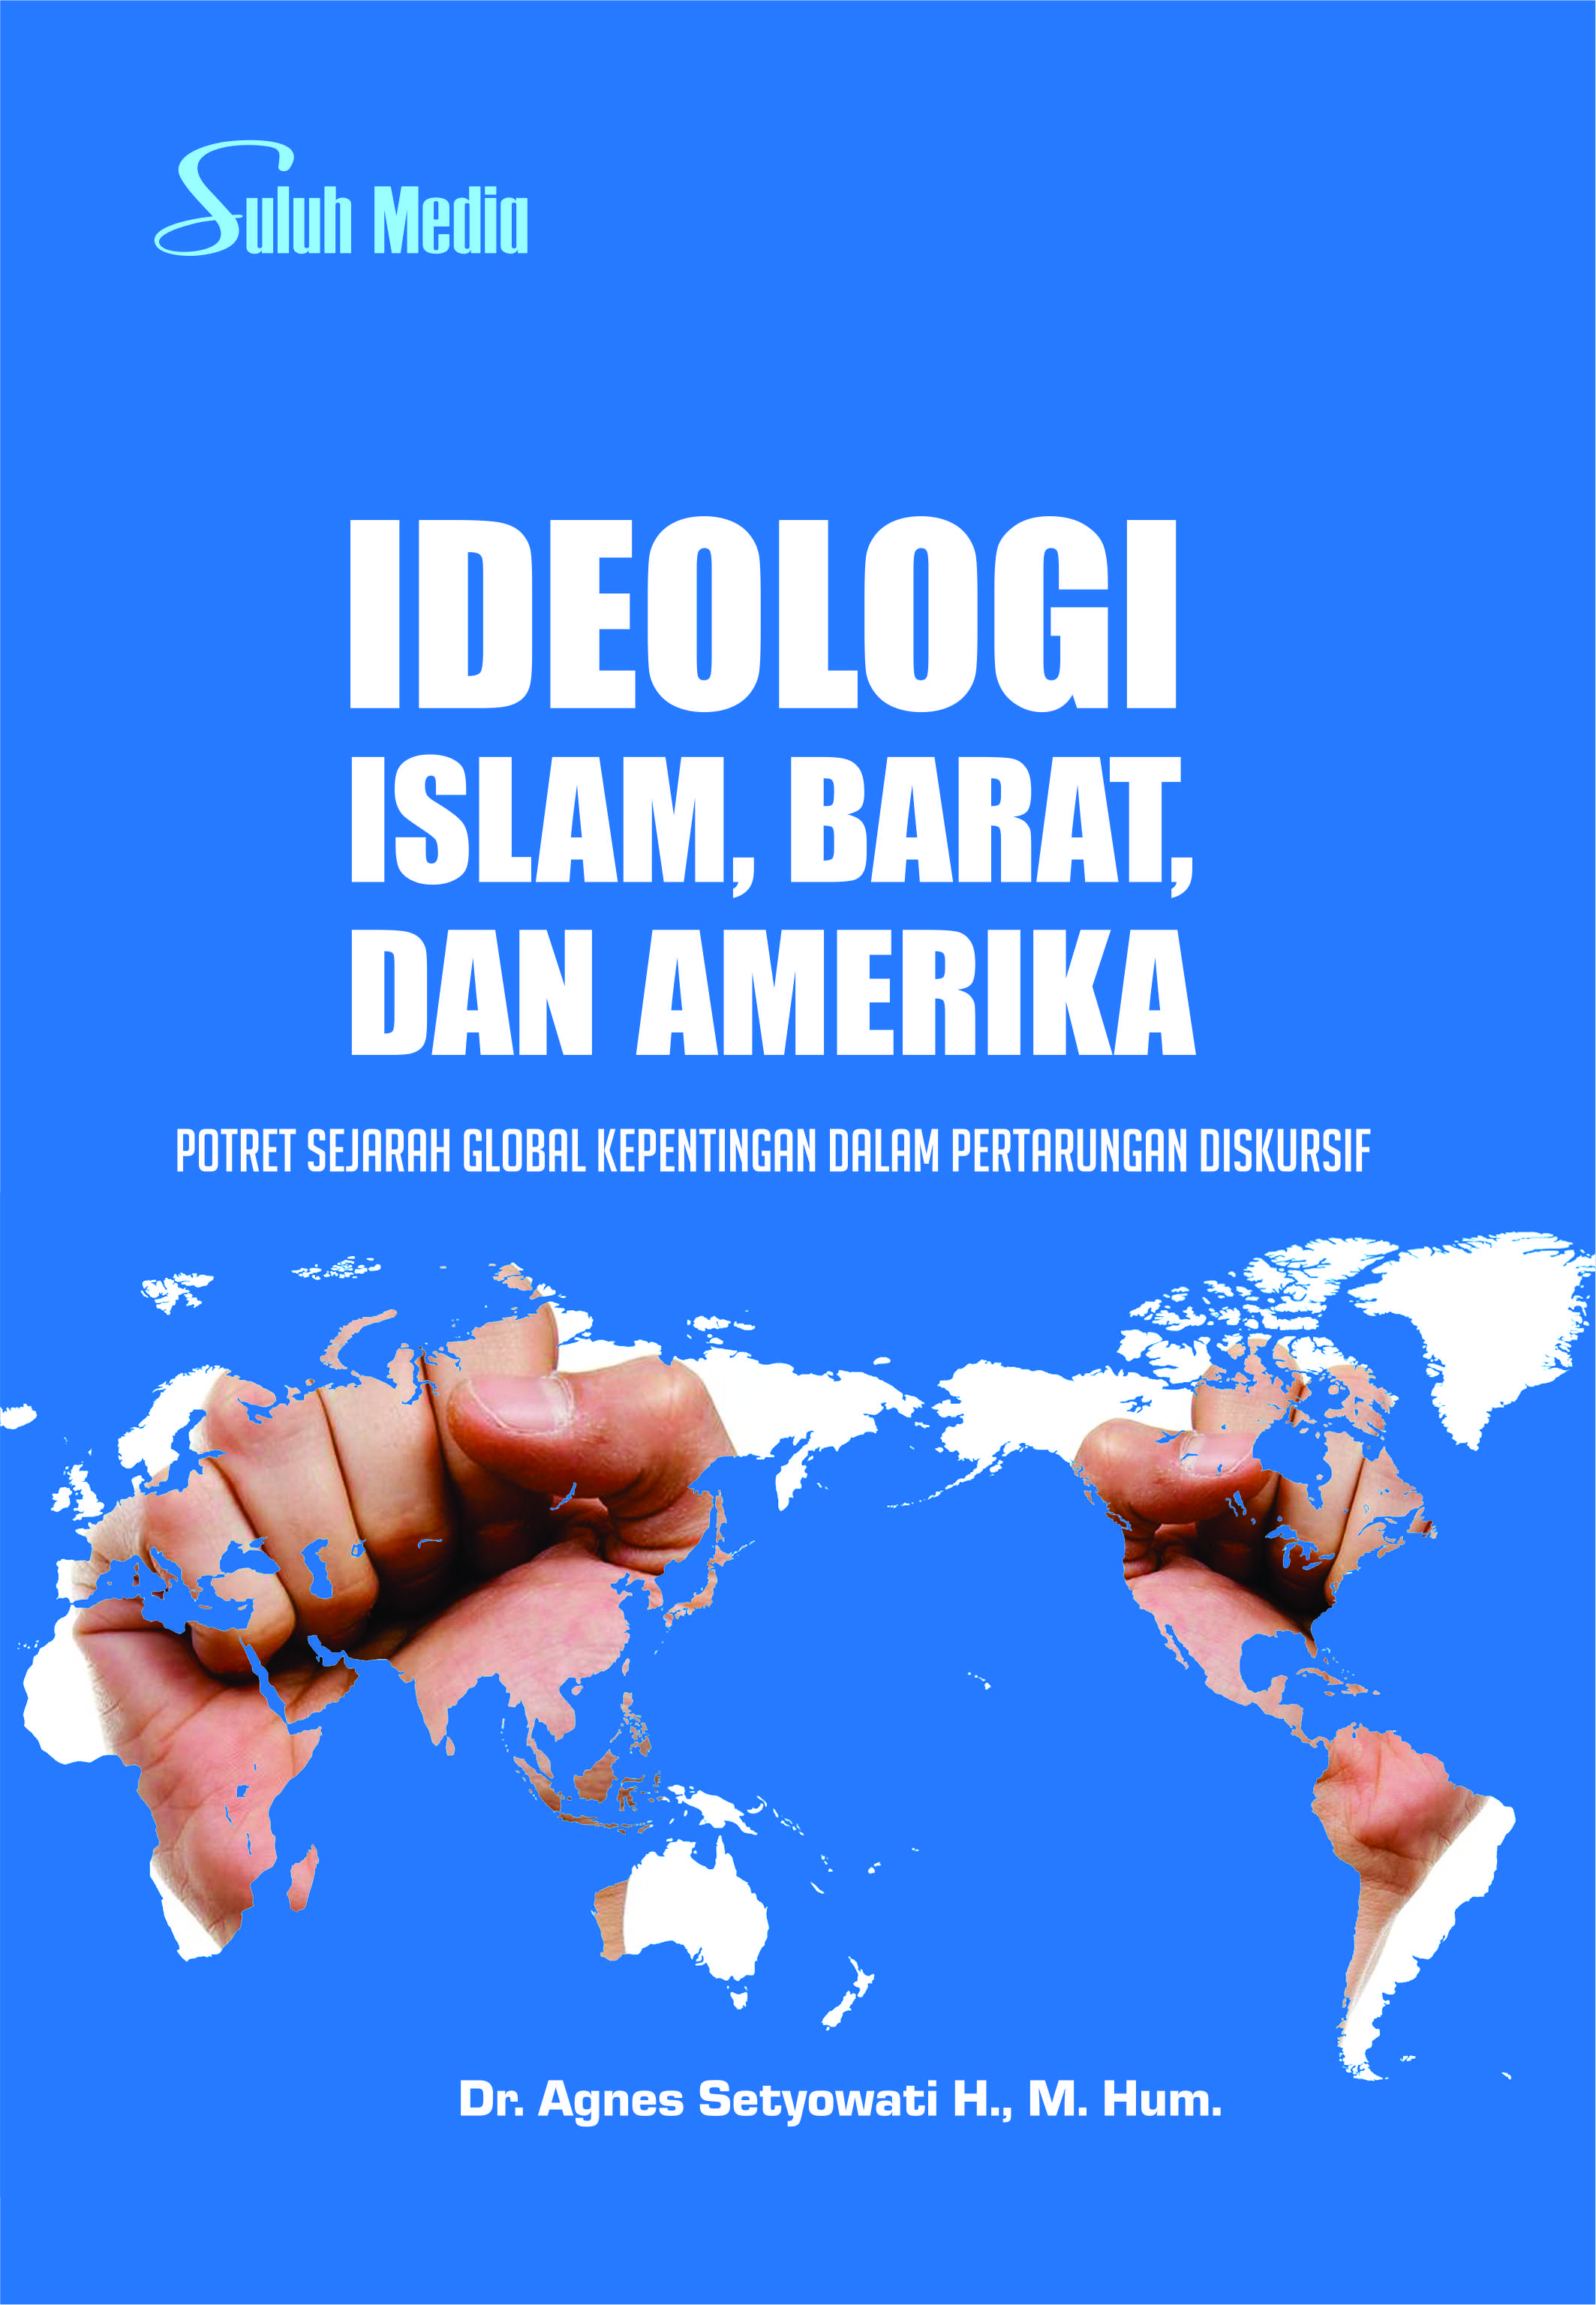 Ideologi islam, barat, dan amerika potret sejarah global kepentingan dalam pertarungan diskursif [sumber elektronis]